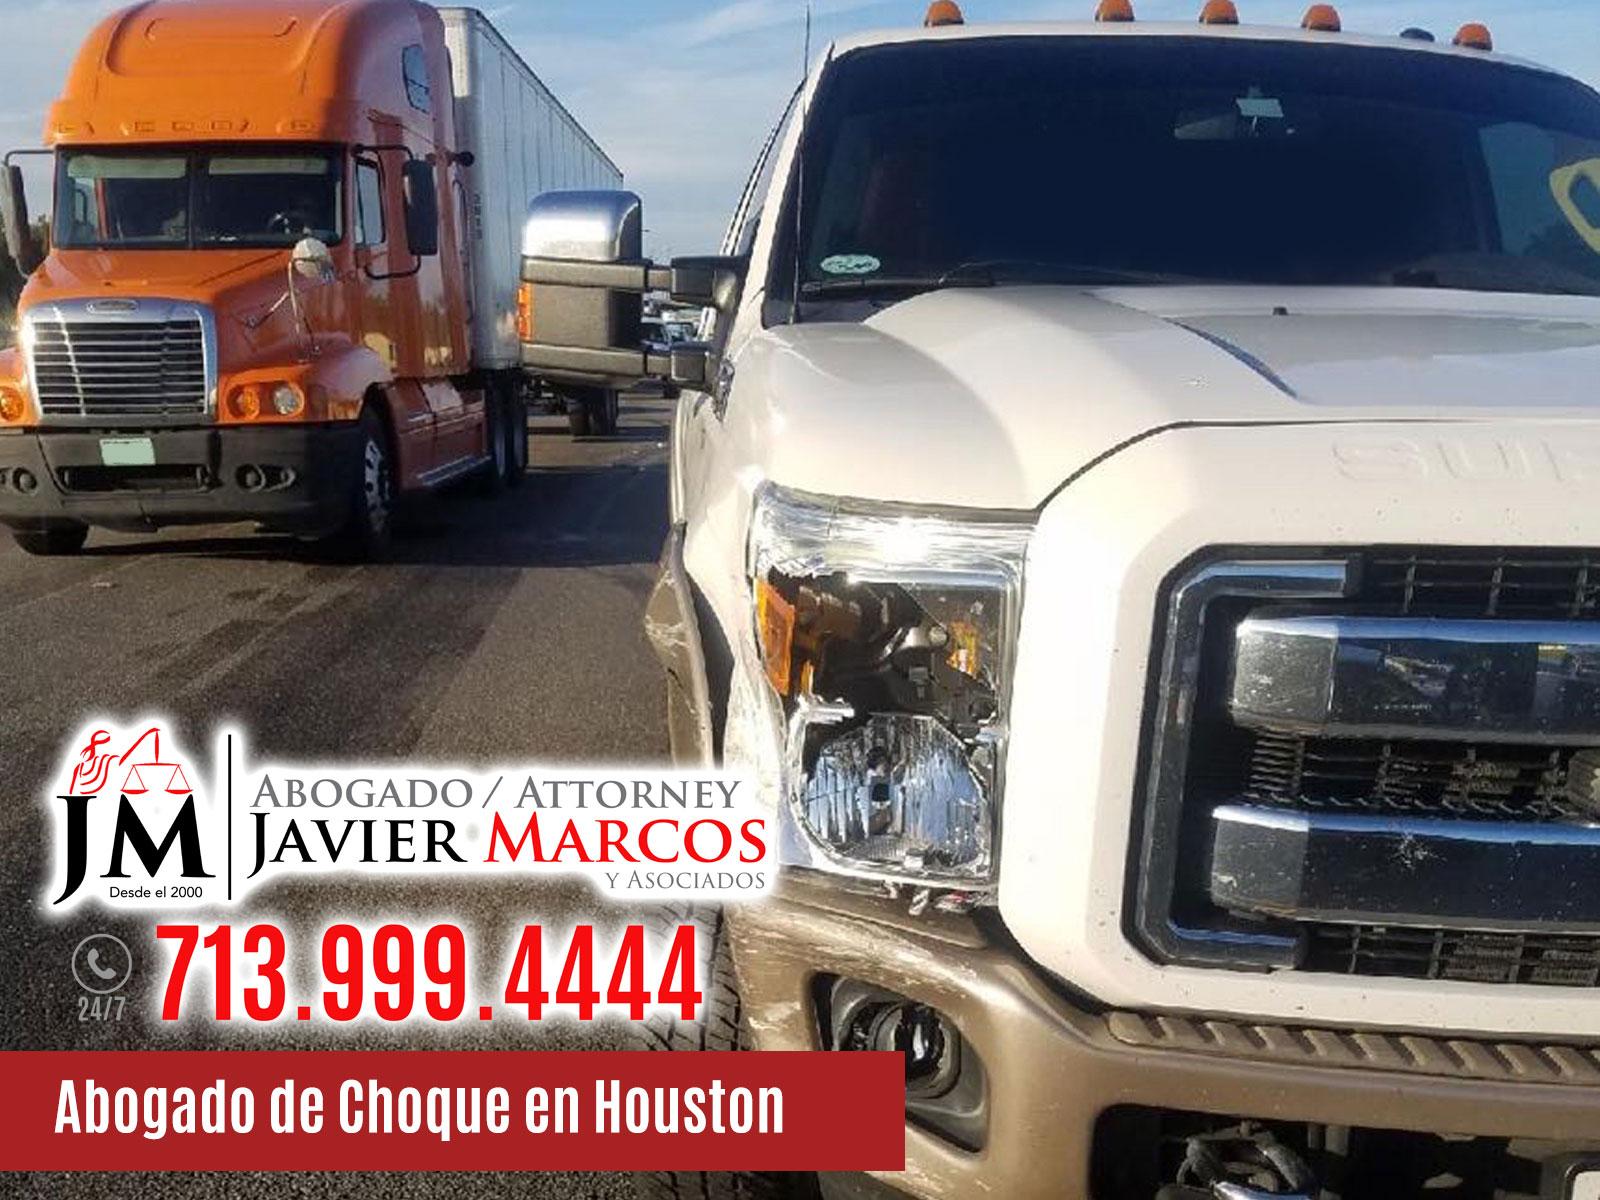 Abogado de Choque en Houston | Abogado Javier Marcos | 713.999.4444